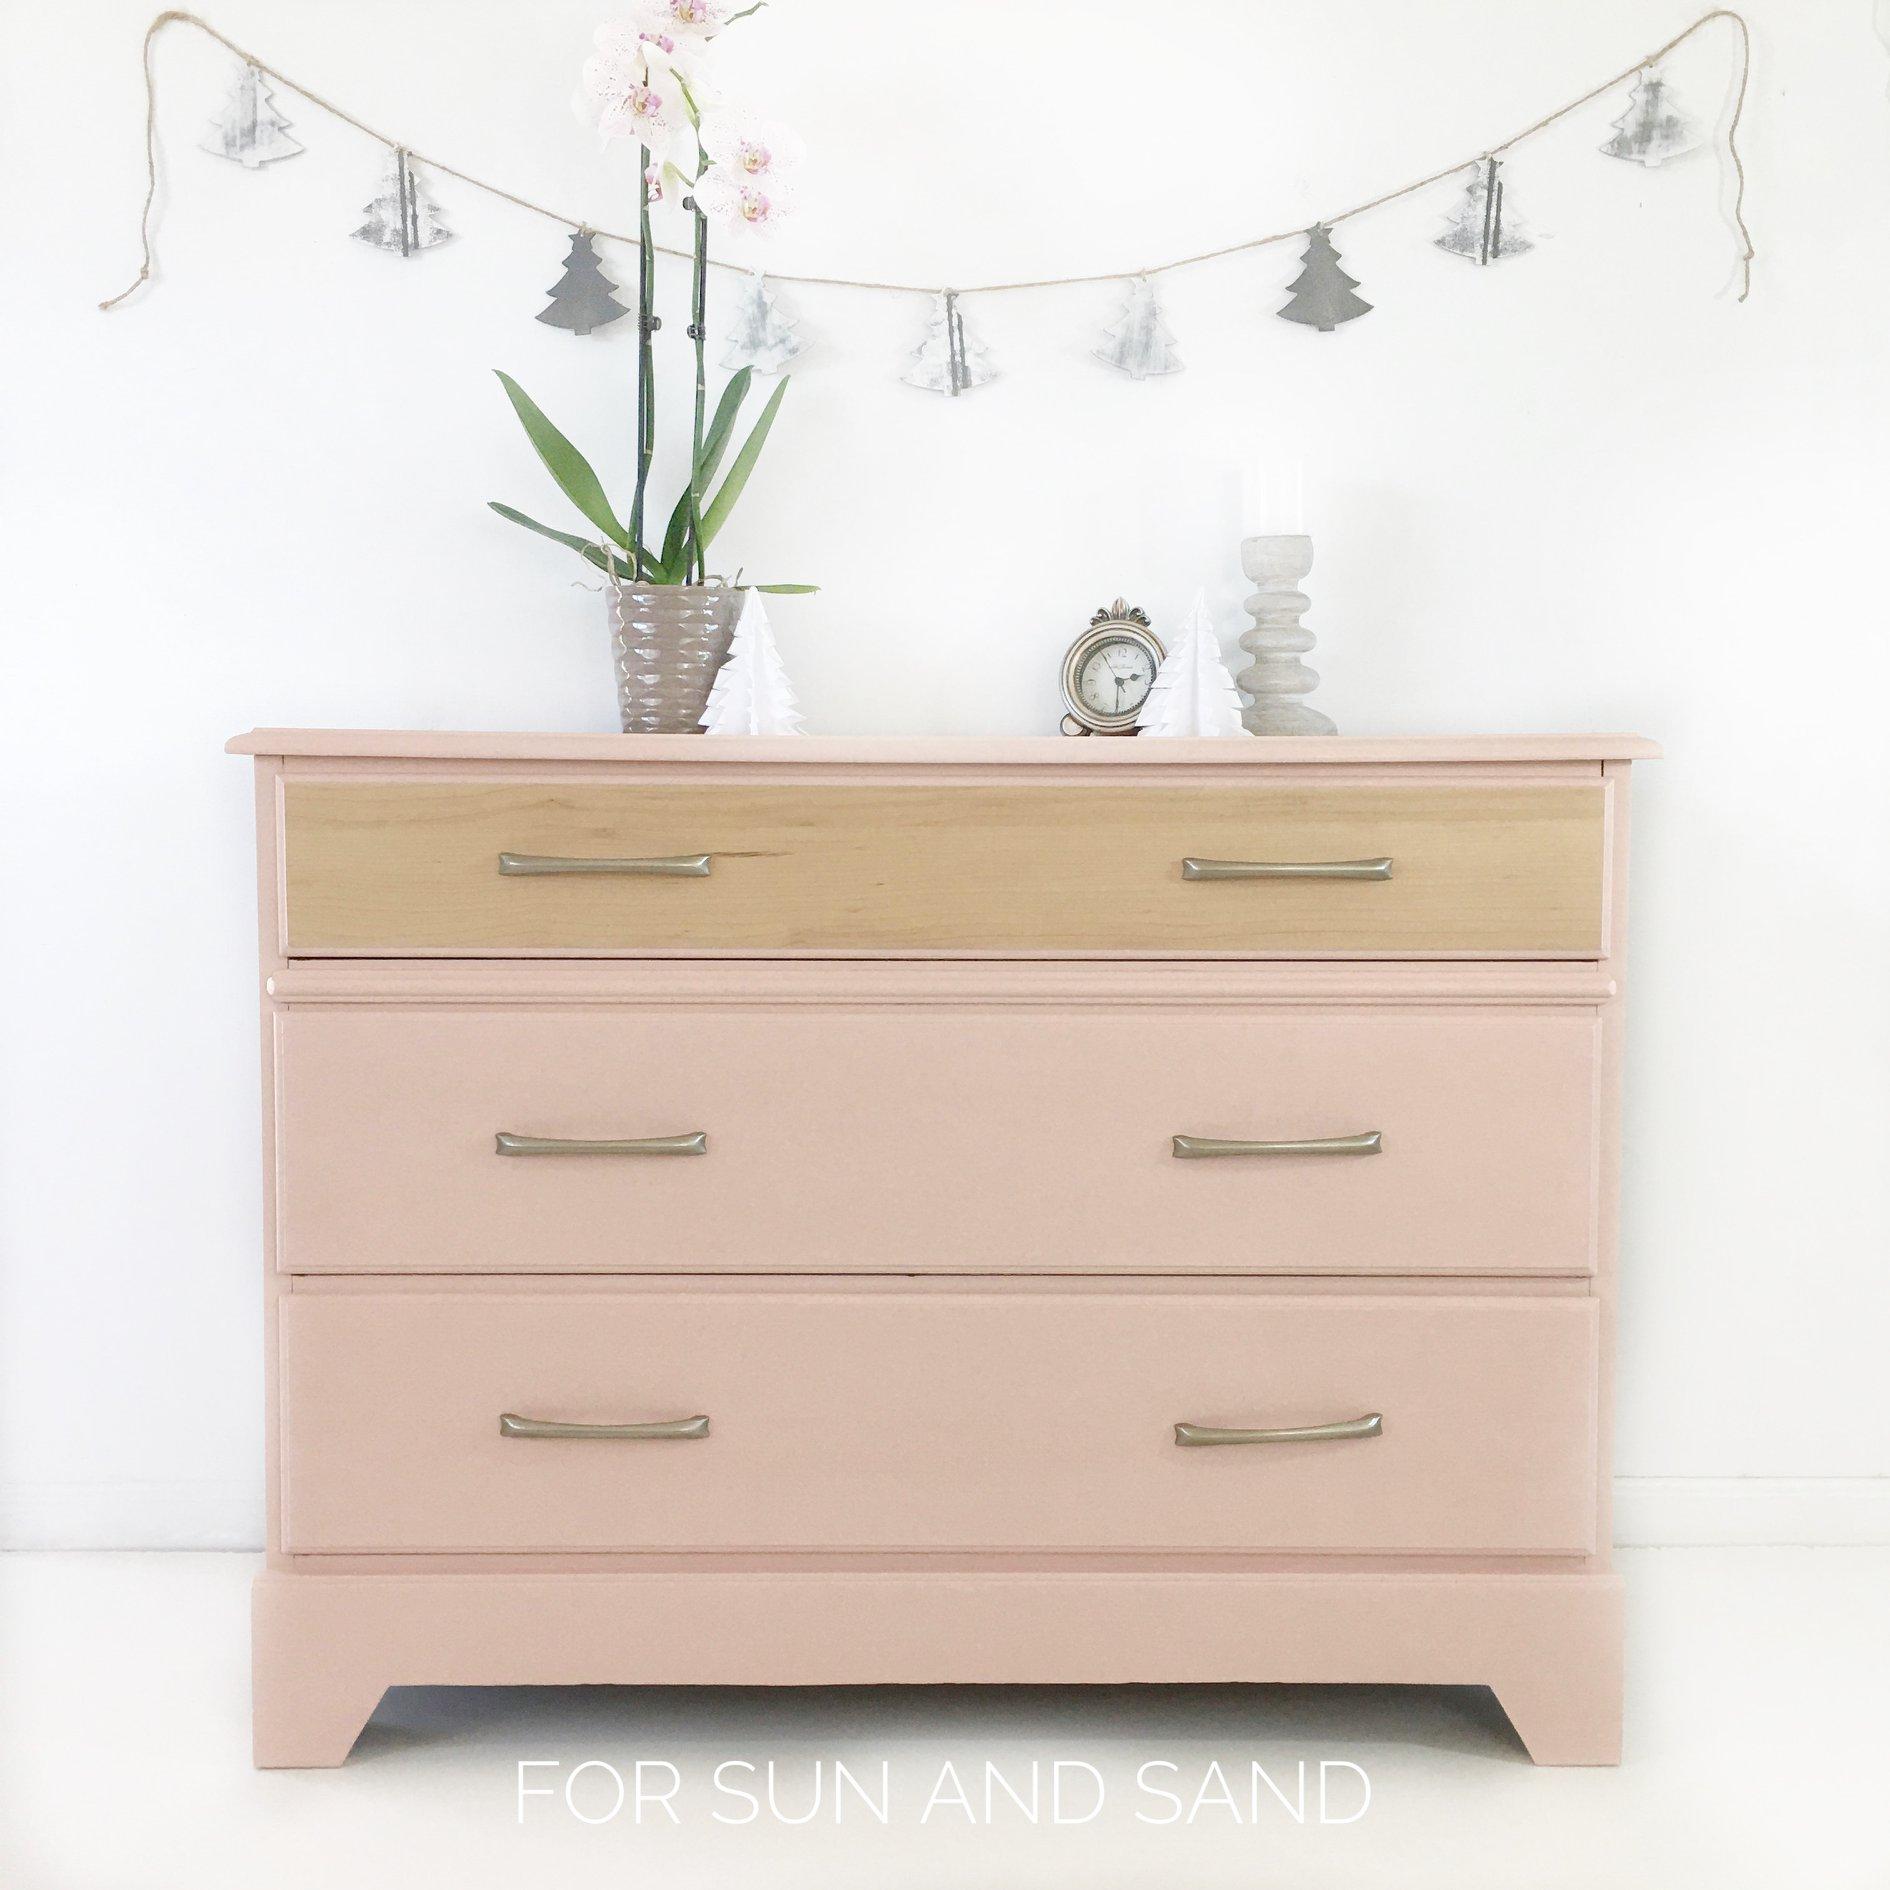 Modern Three Drawer Dresser in Ooh La La with Natural Wood Drawer